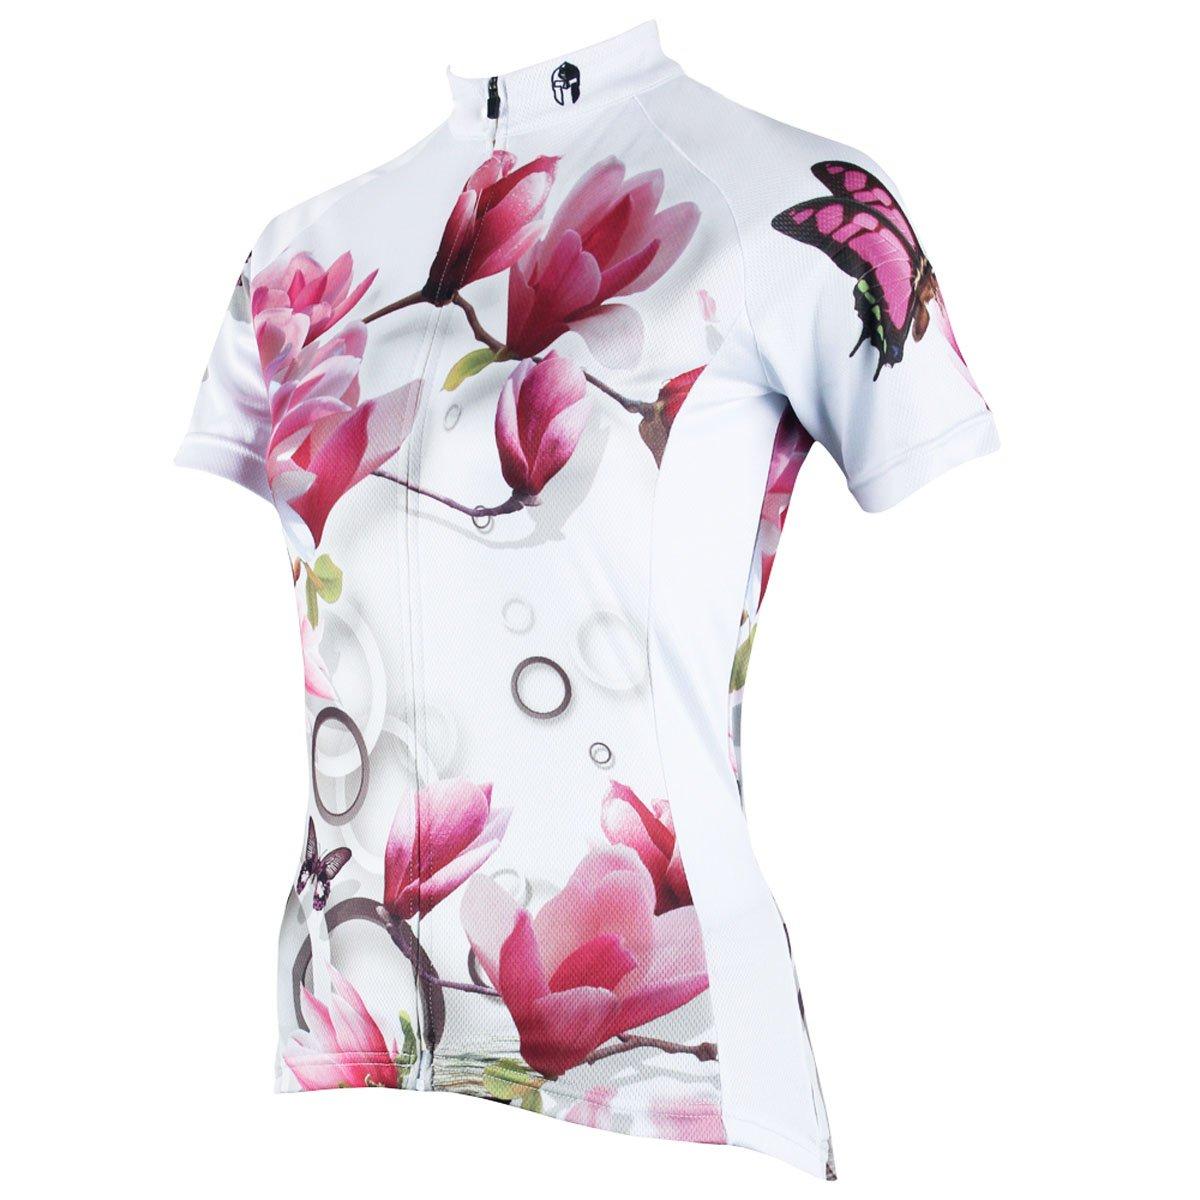 4801f4116 Amazon.com  ILPALADINO Women s Cycling Jersey Short Sleeve Biking Shirts  Flowers Butterflies  Clothing